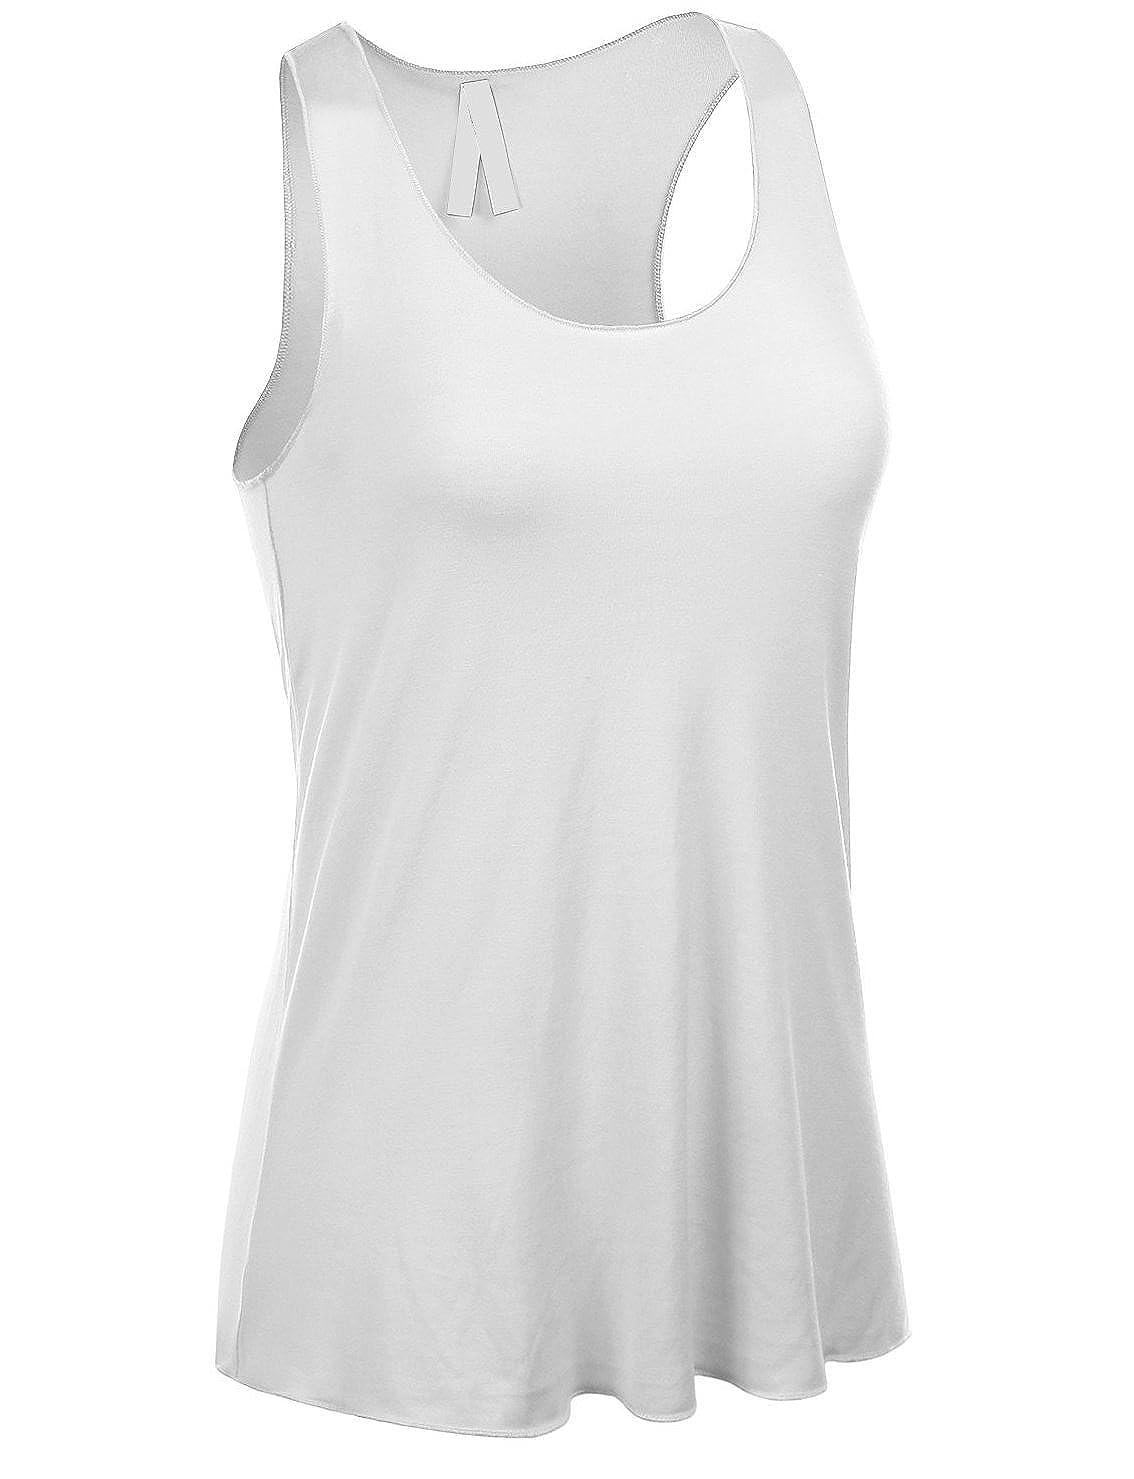 68d7b75fcebec Emmalise Women s Flowey Lightweight Yoga Workout Tank Top Tee Tshirt -  Junior Sizes at Amazon Women s Clothing store